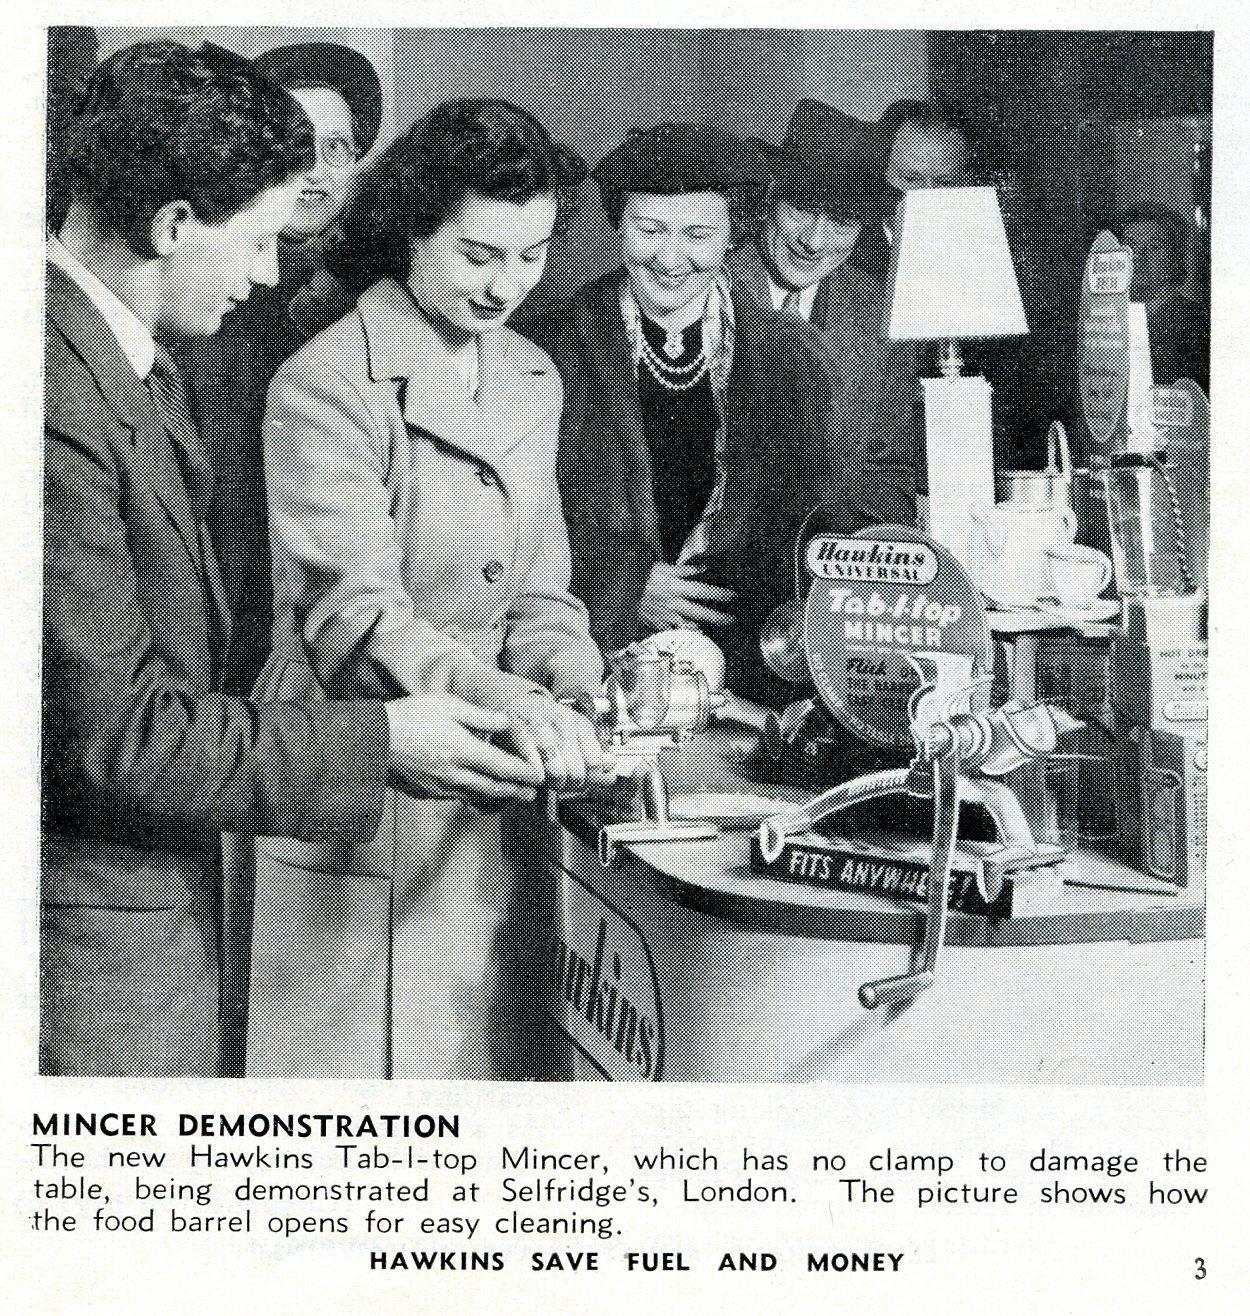 Hawkins Tecal 1200 on display at Selfridges Mar 1952